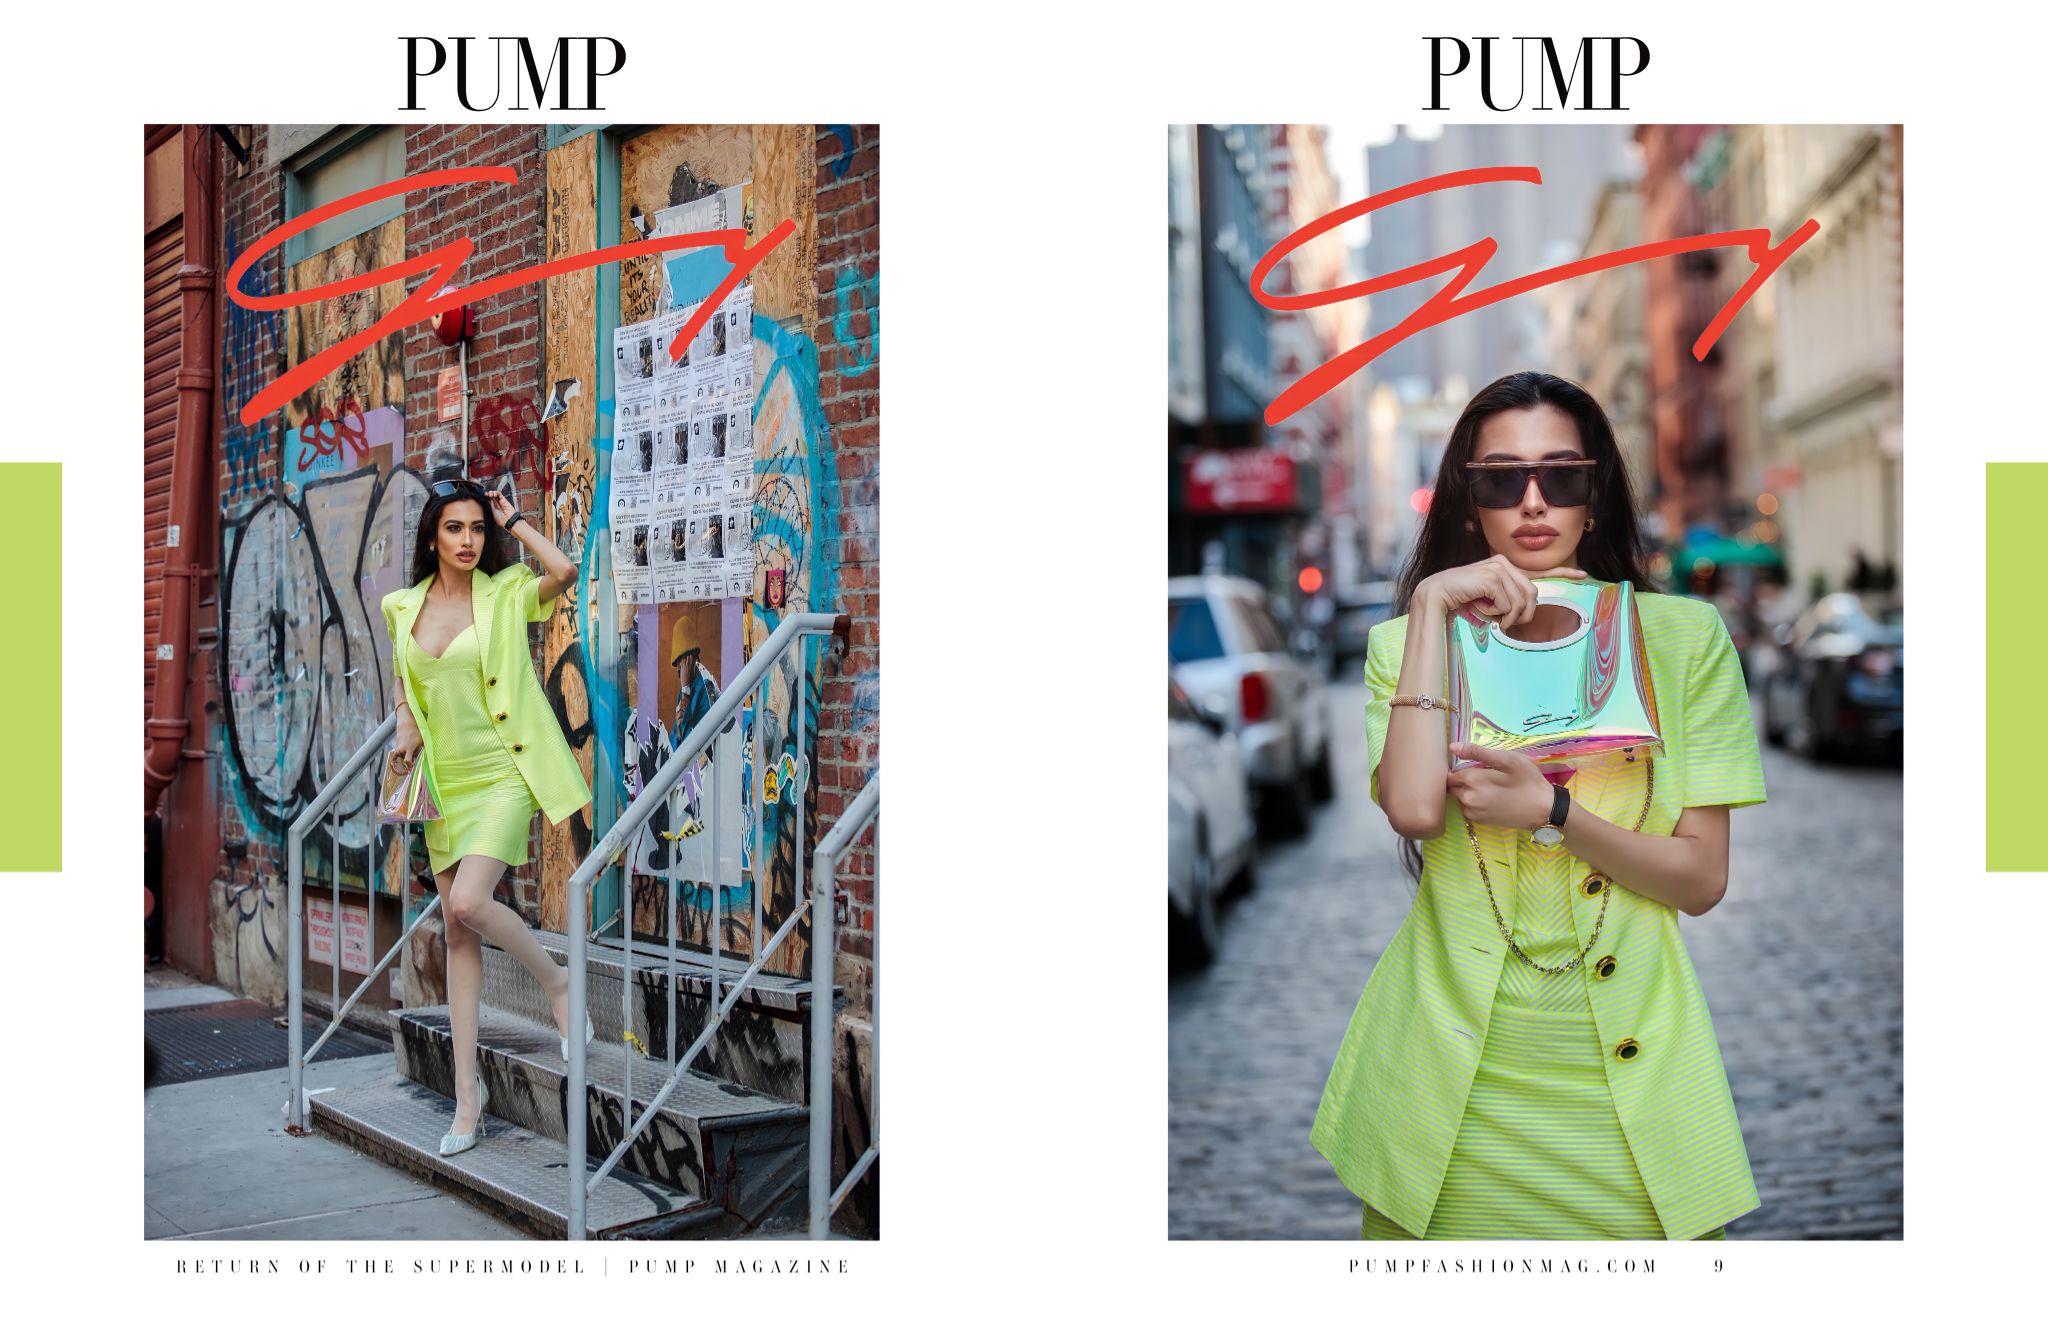 Tear sheet of Pump magazine featuring Farah Zulaikha shot by Tina Boyadjieva